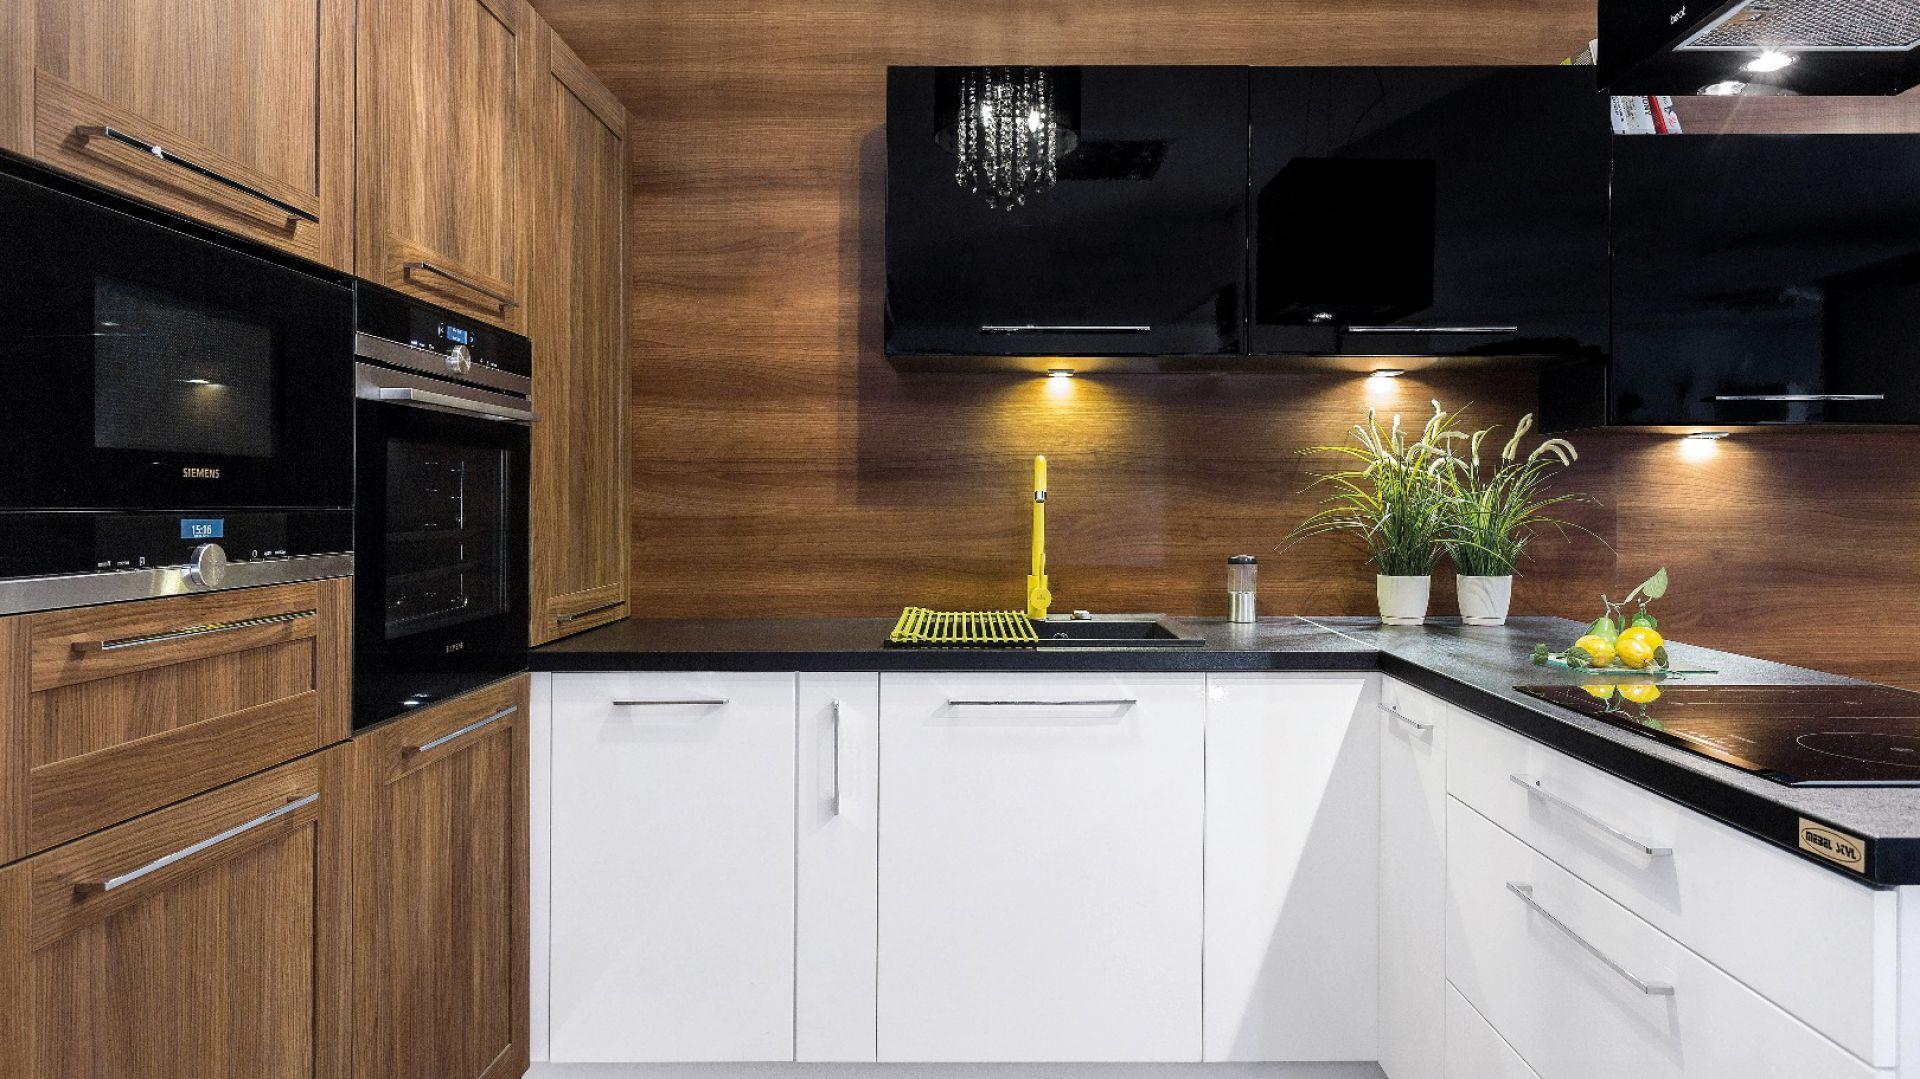 Blat roboczy w kuchni. Fot. Studio Max Kuchnie Mebel Styl